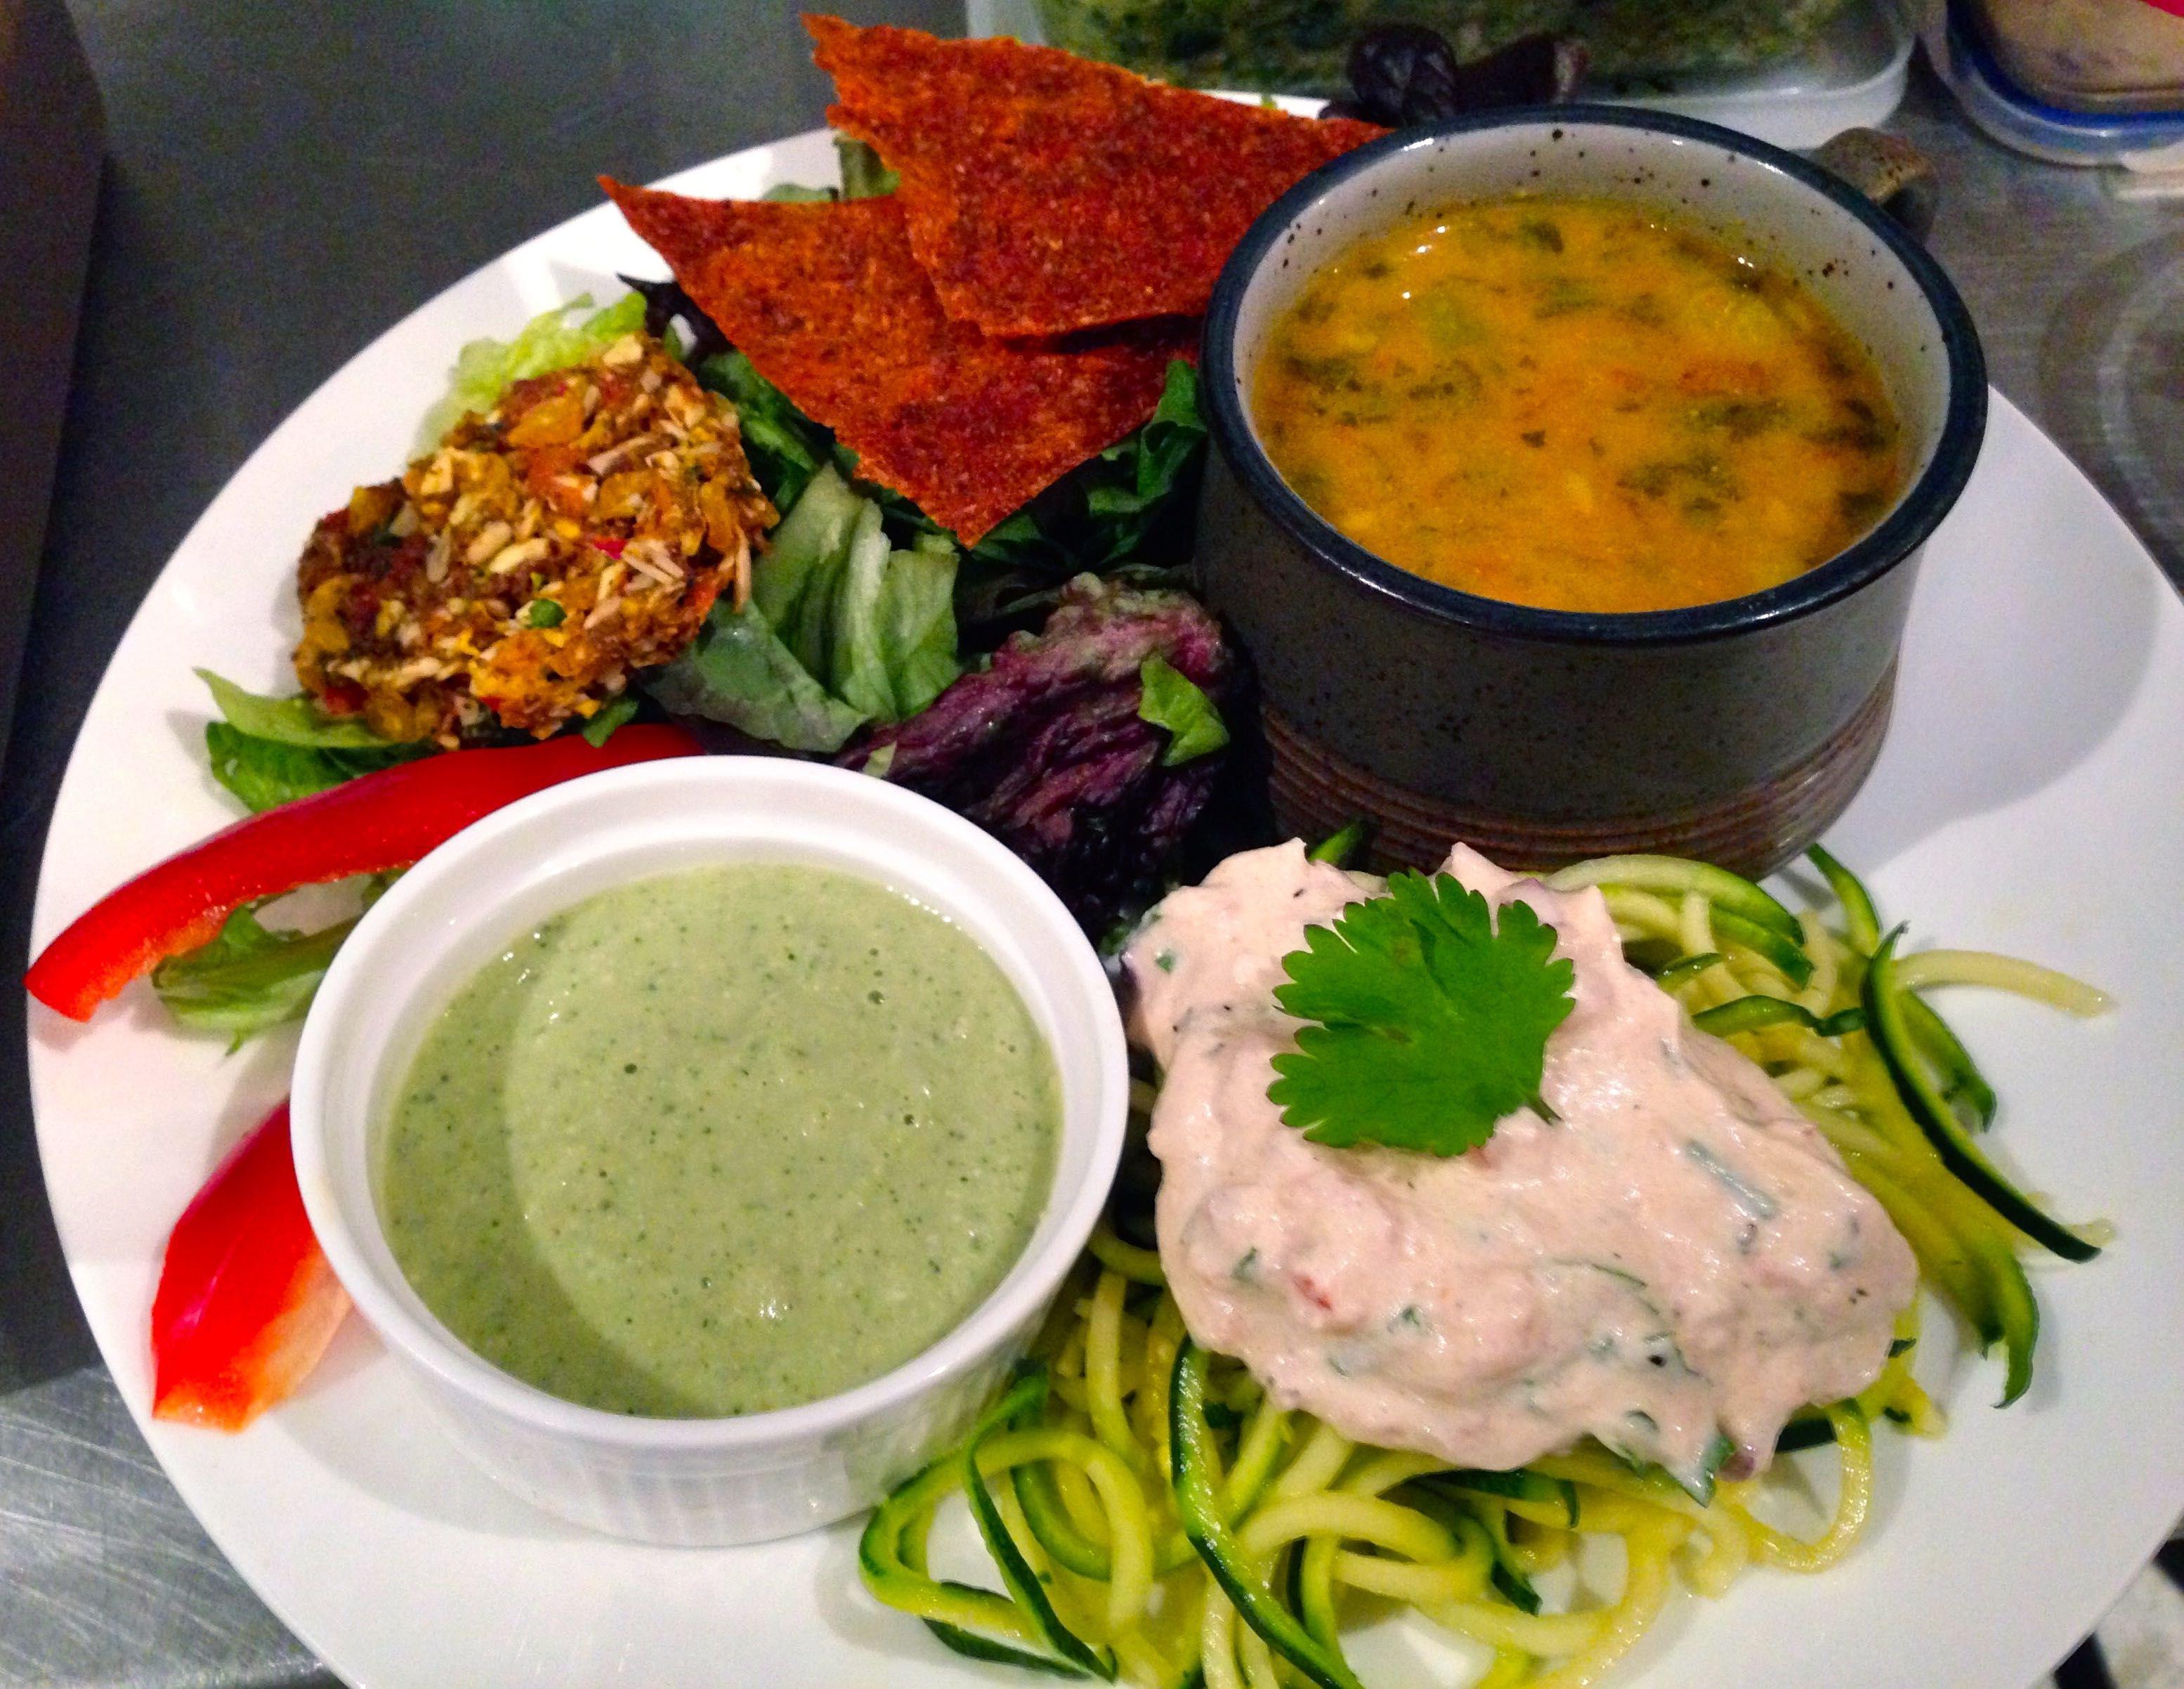 16 Best Raw Vegan Restaurants Uk Images On Pinterest Leaf Vegetable And